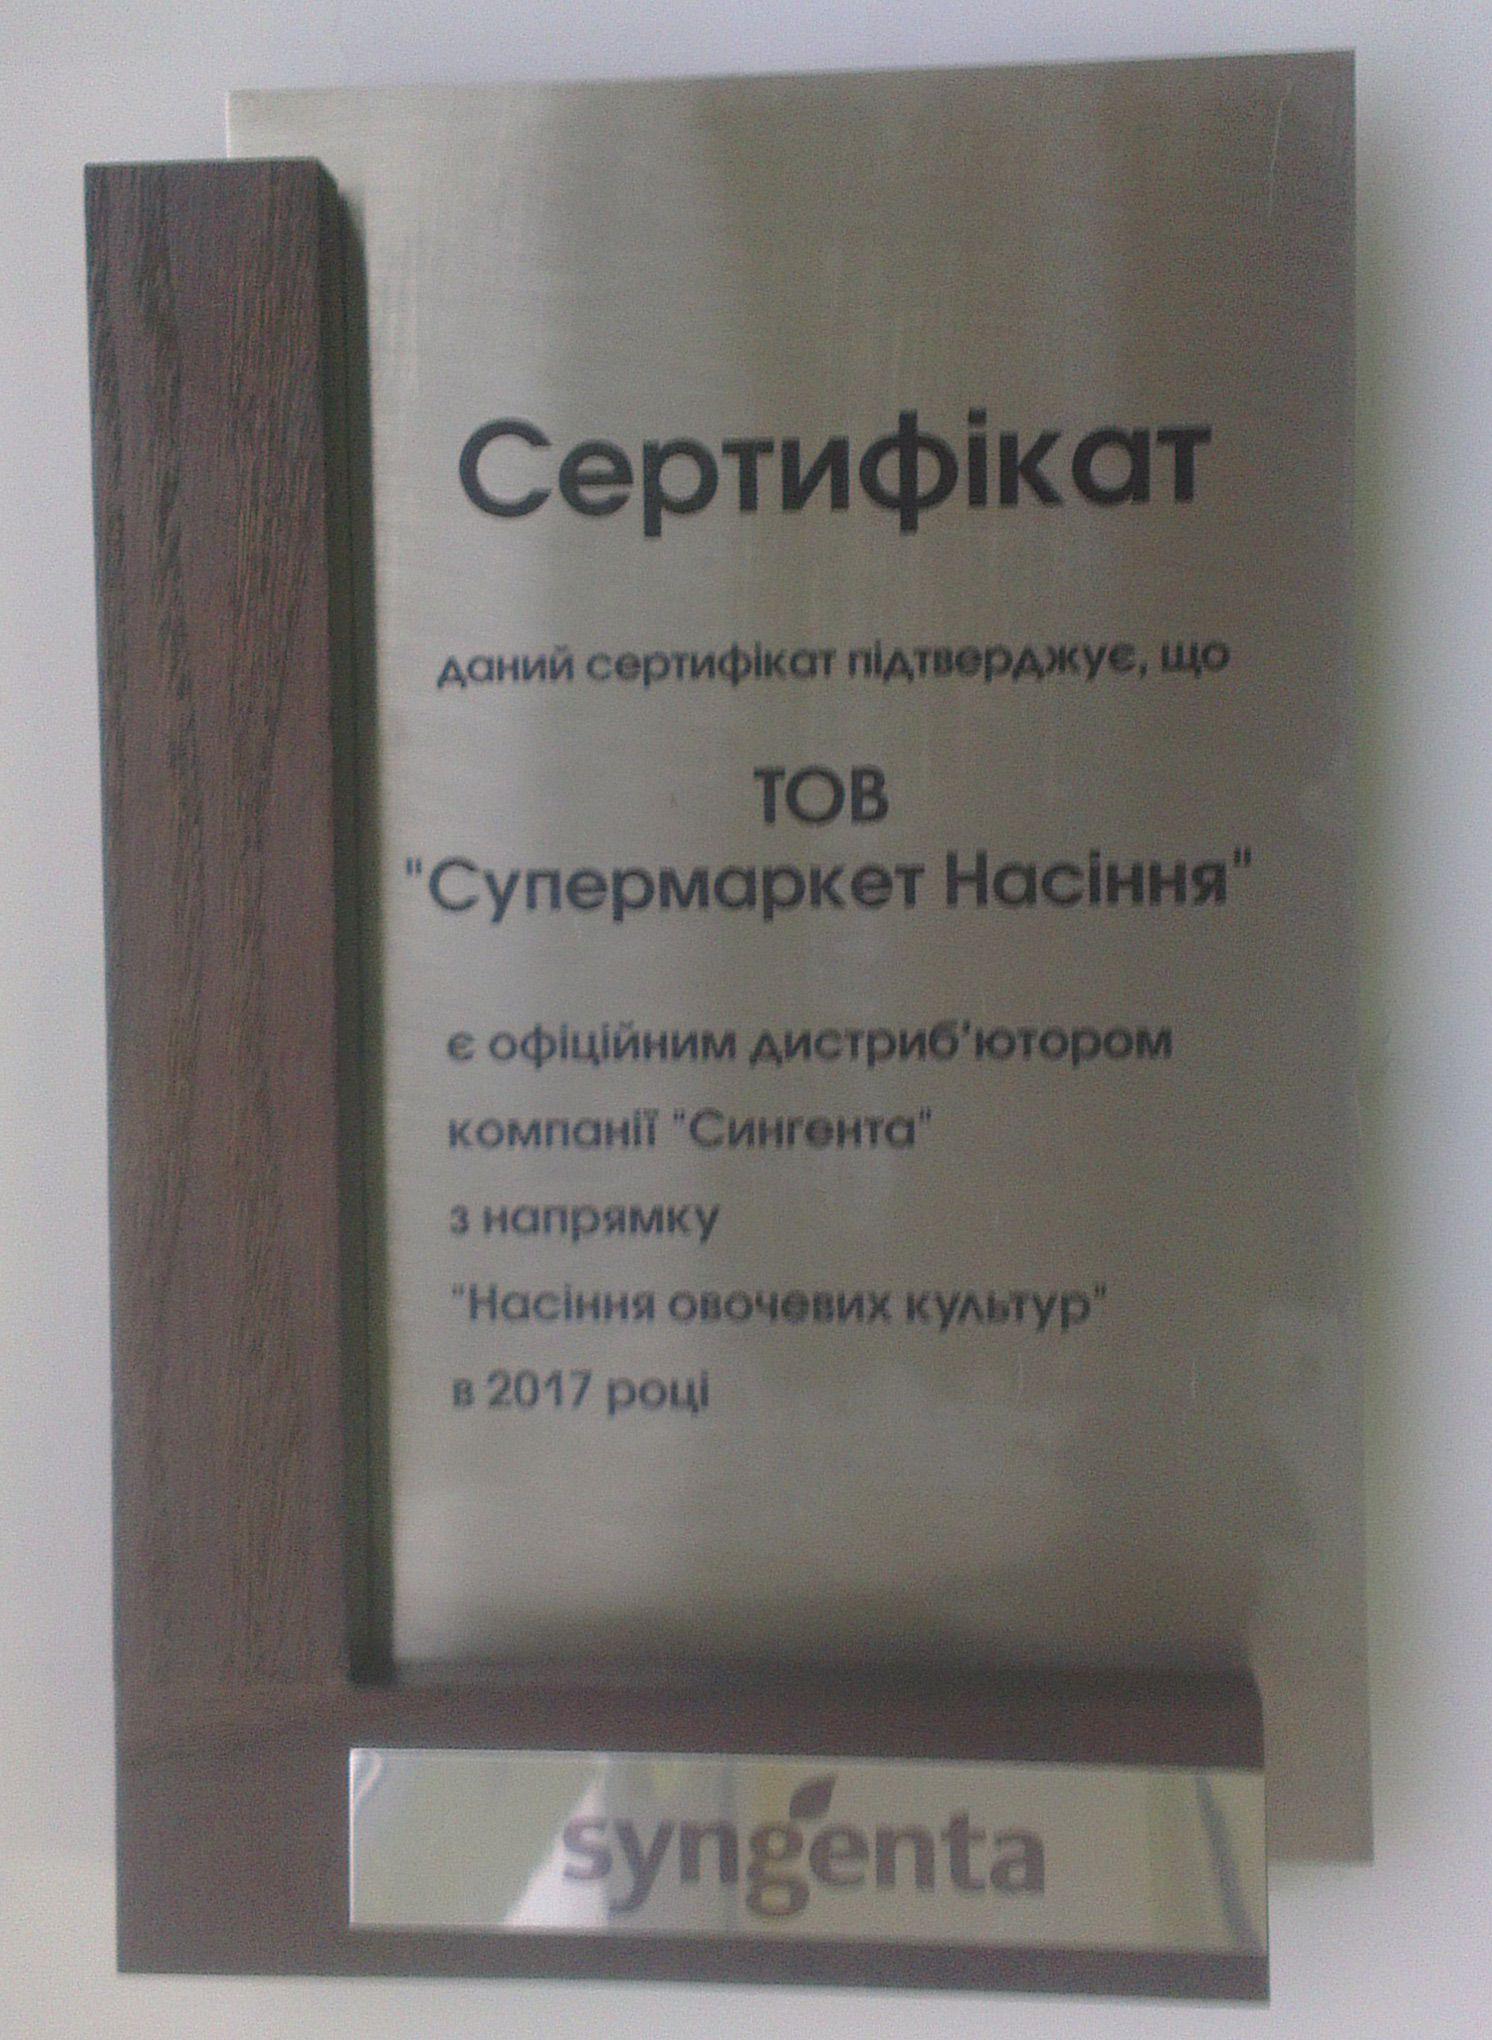 Сертификат Syngenta